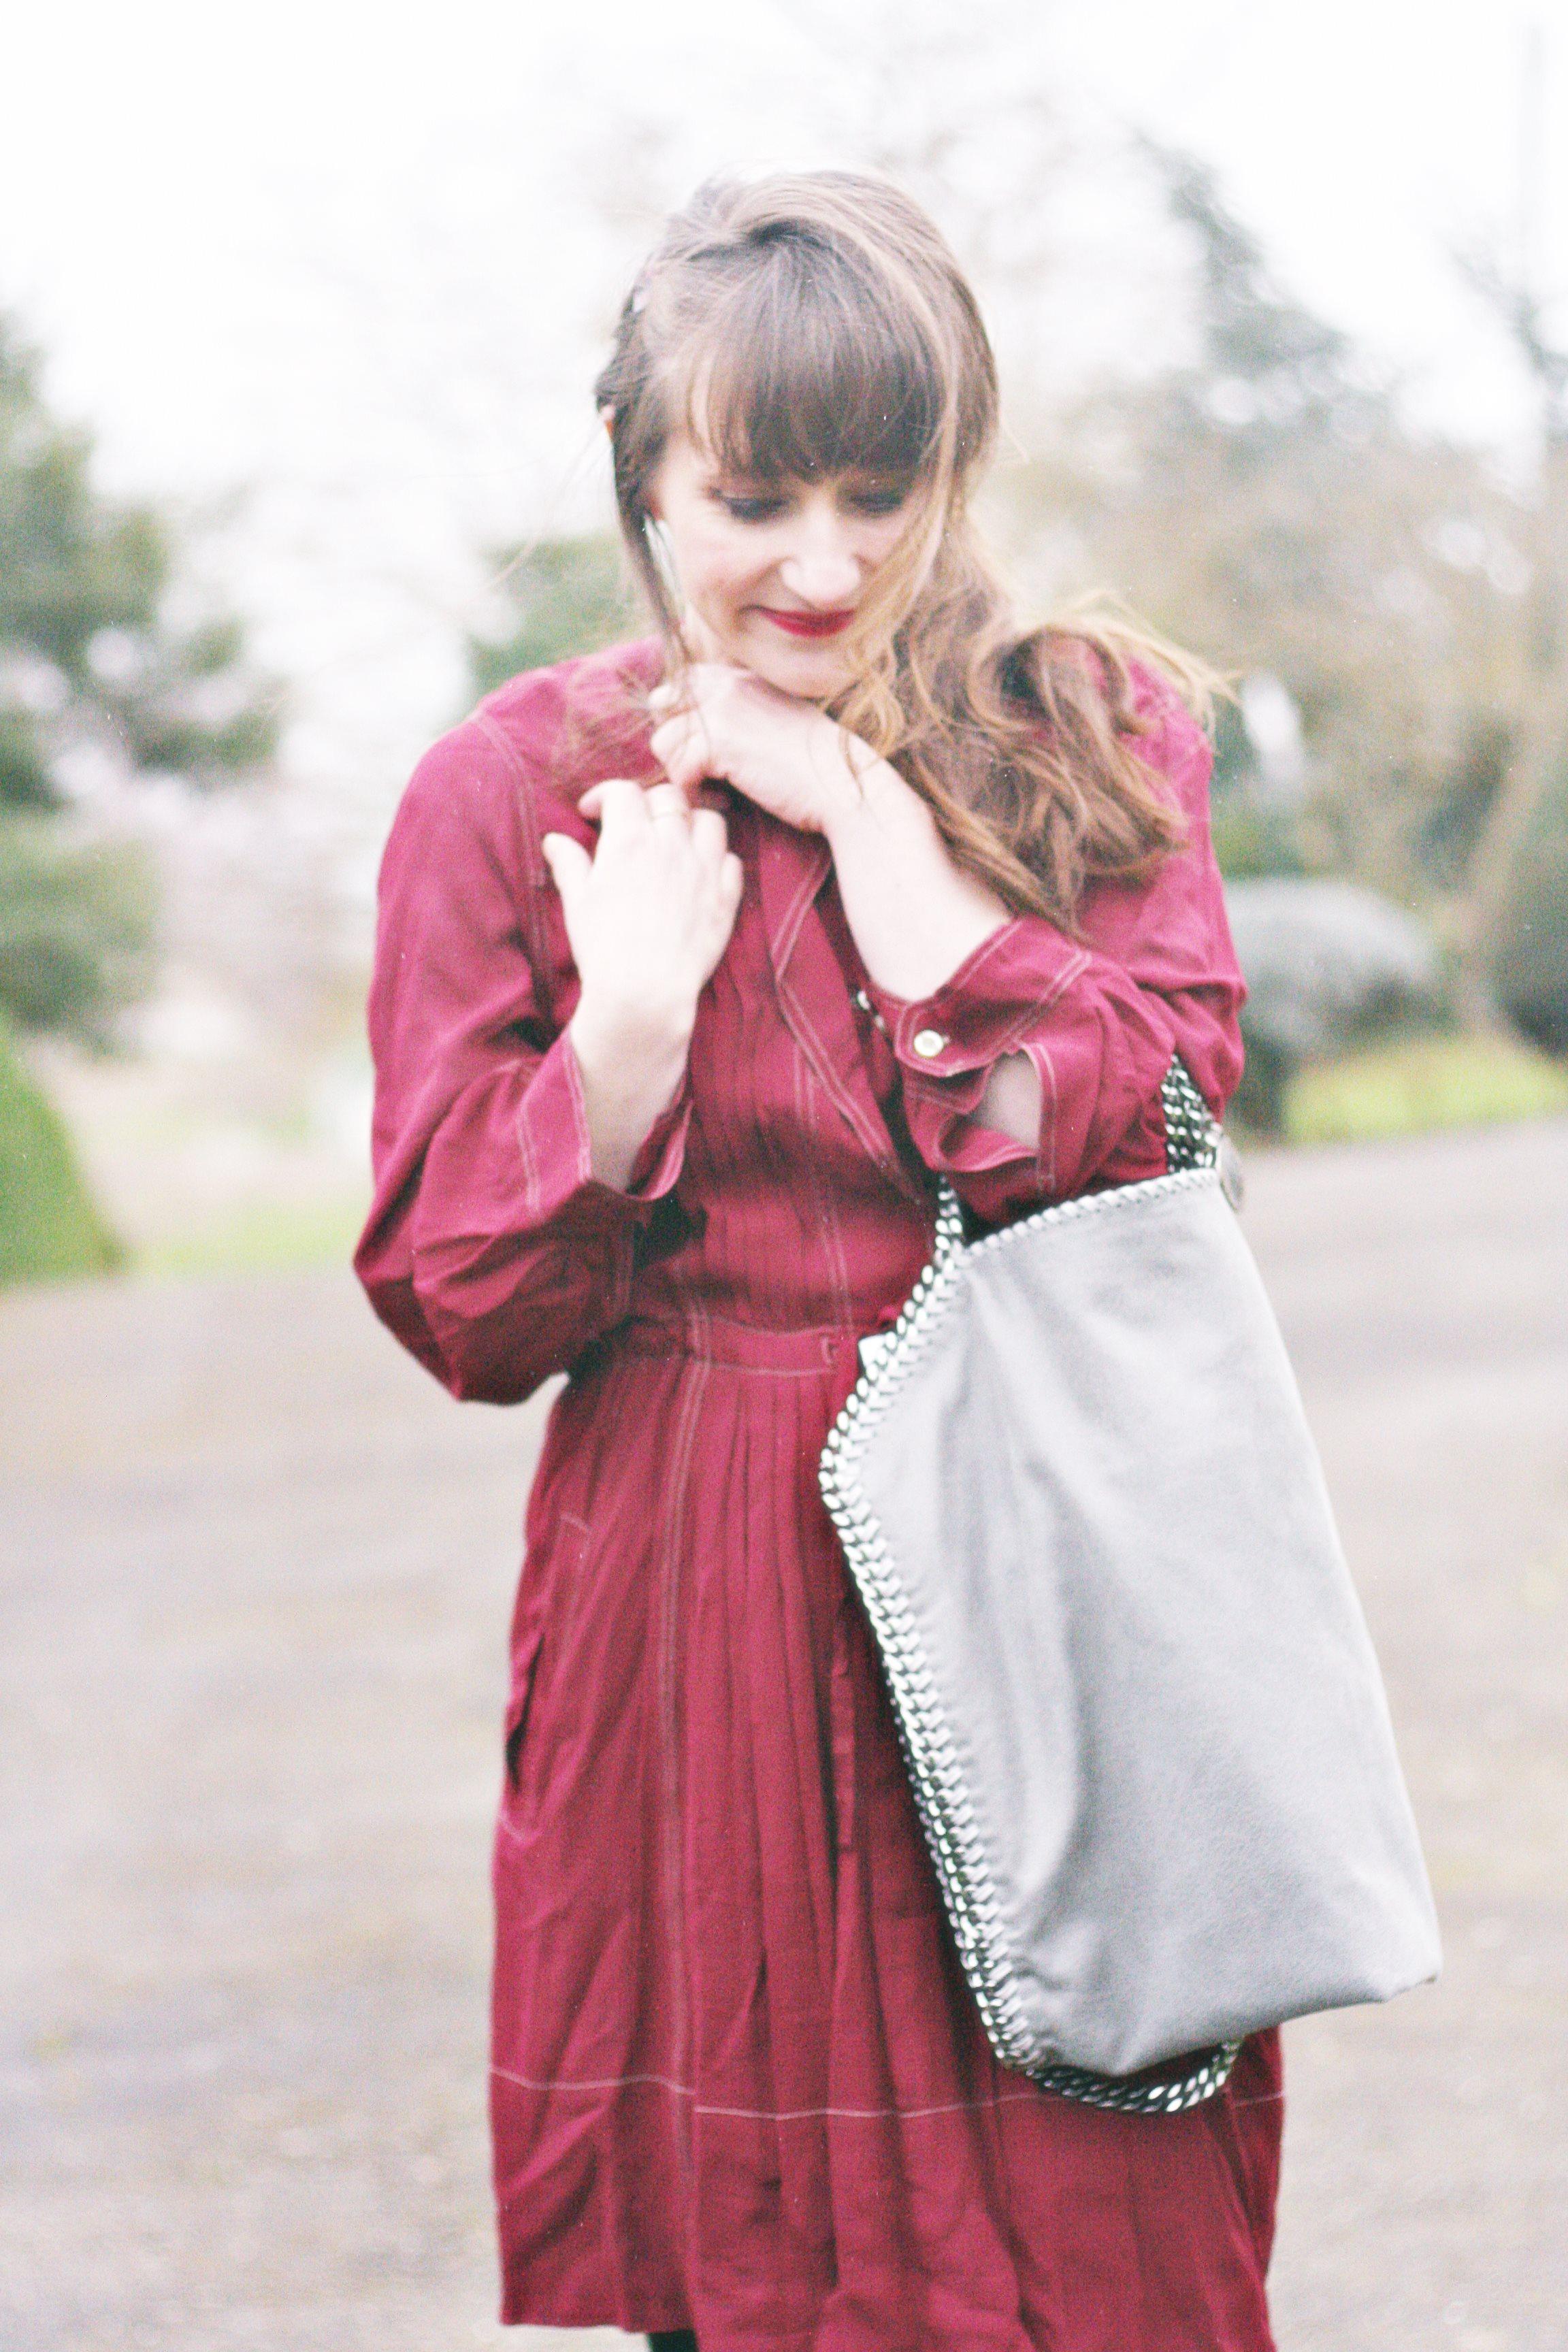 robe-en-soie-isabel-marant-lookisabelmarant-blog-mode-sac-stellamccartney-falabella